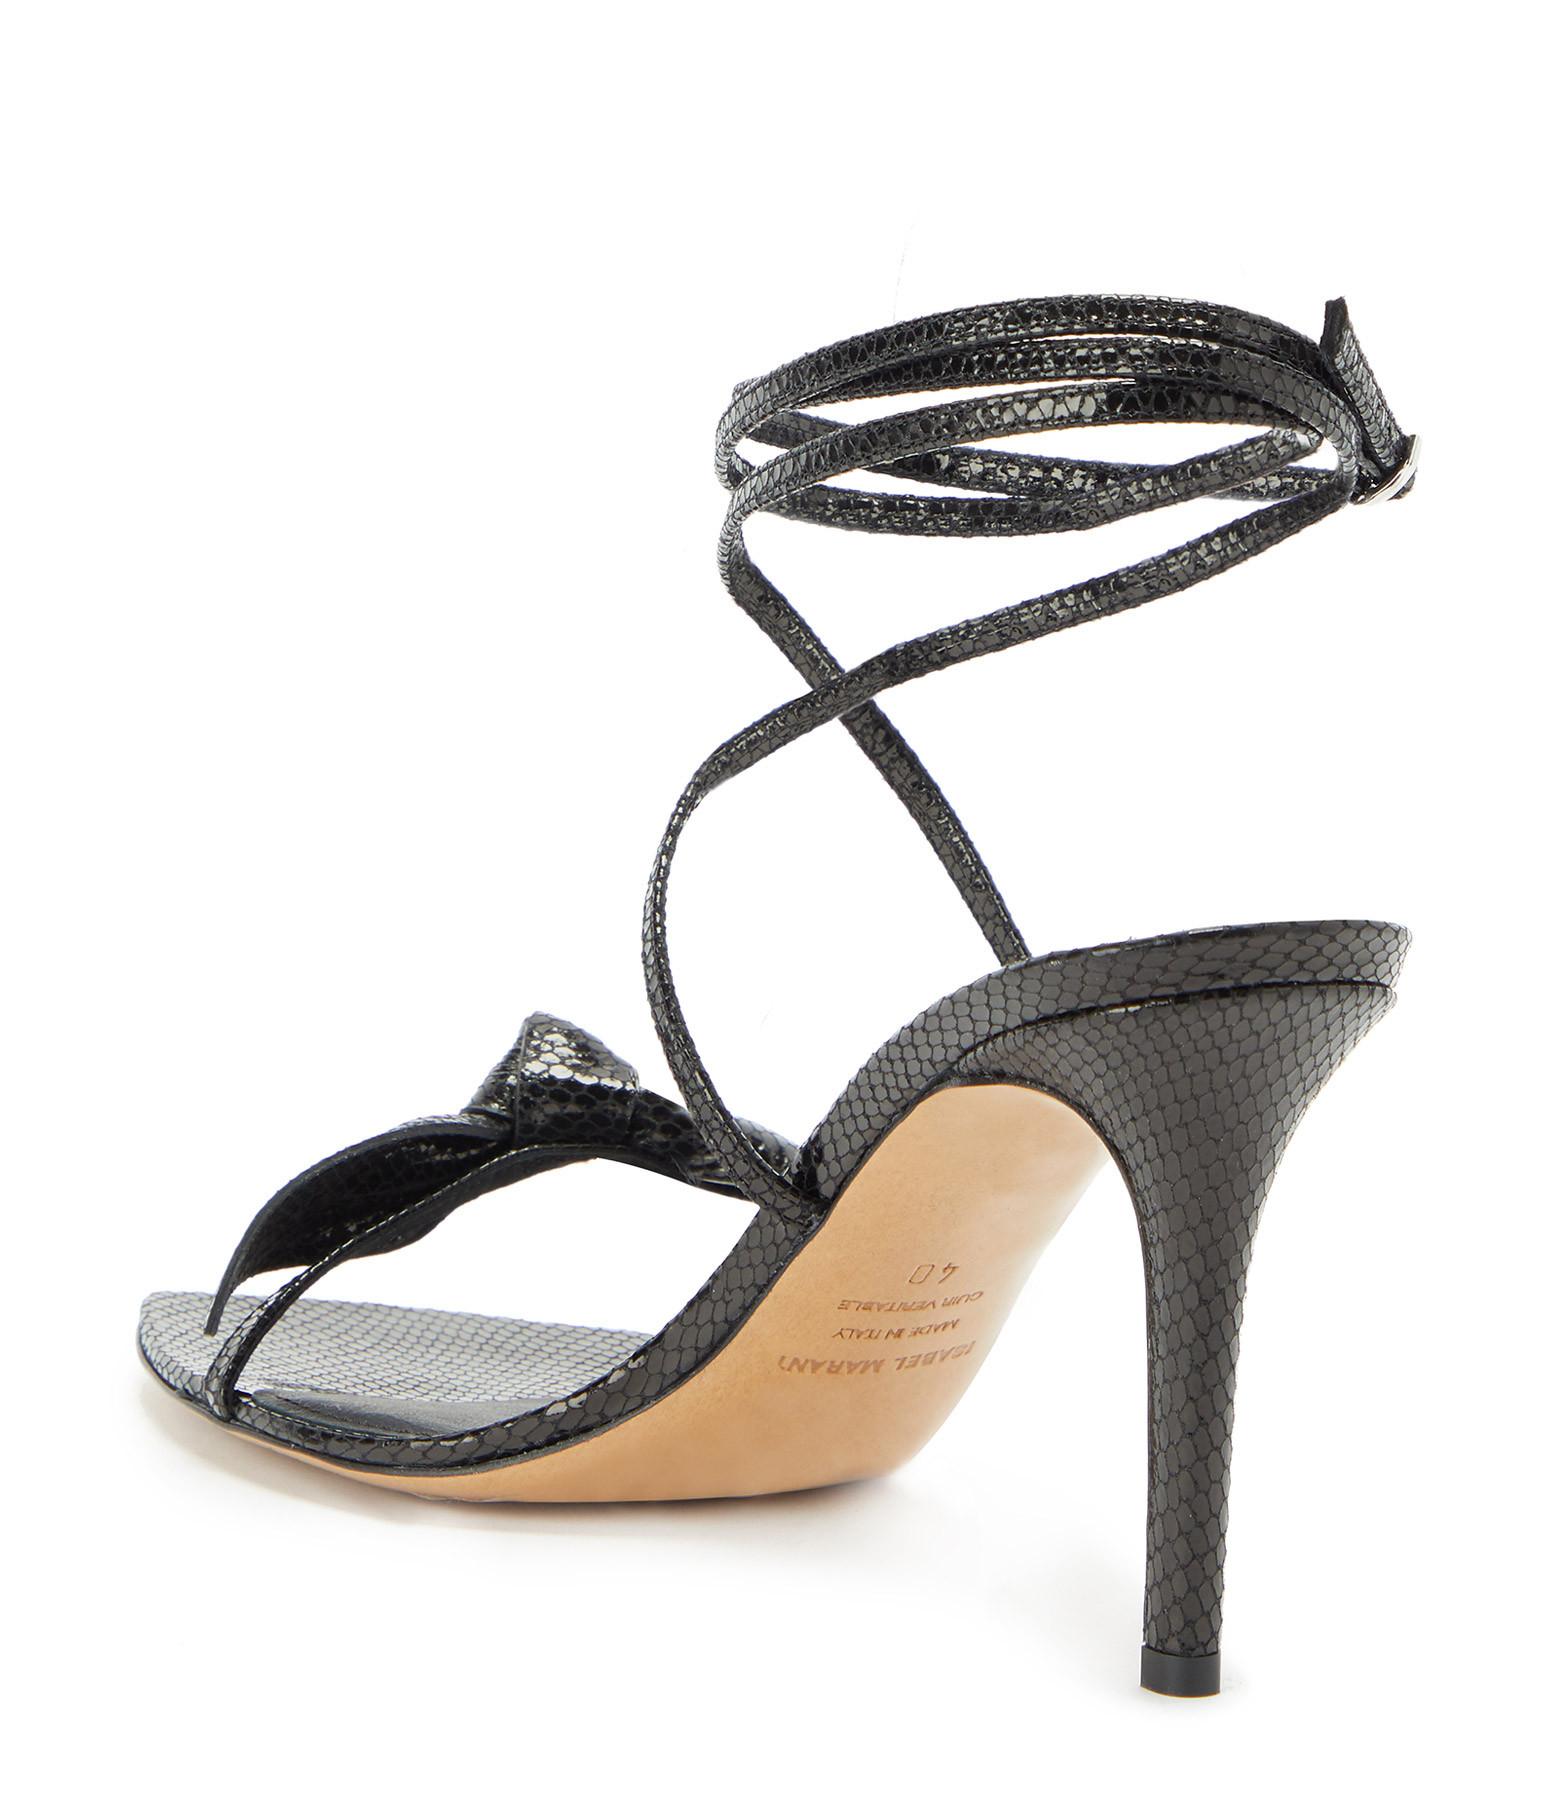 ISABEL MARANT - Sandales Alt Cuir Noir